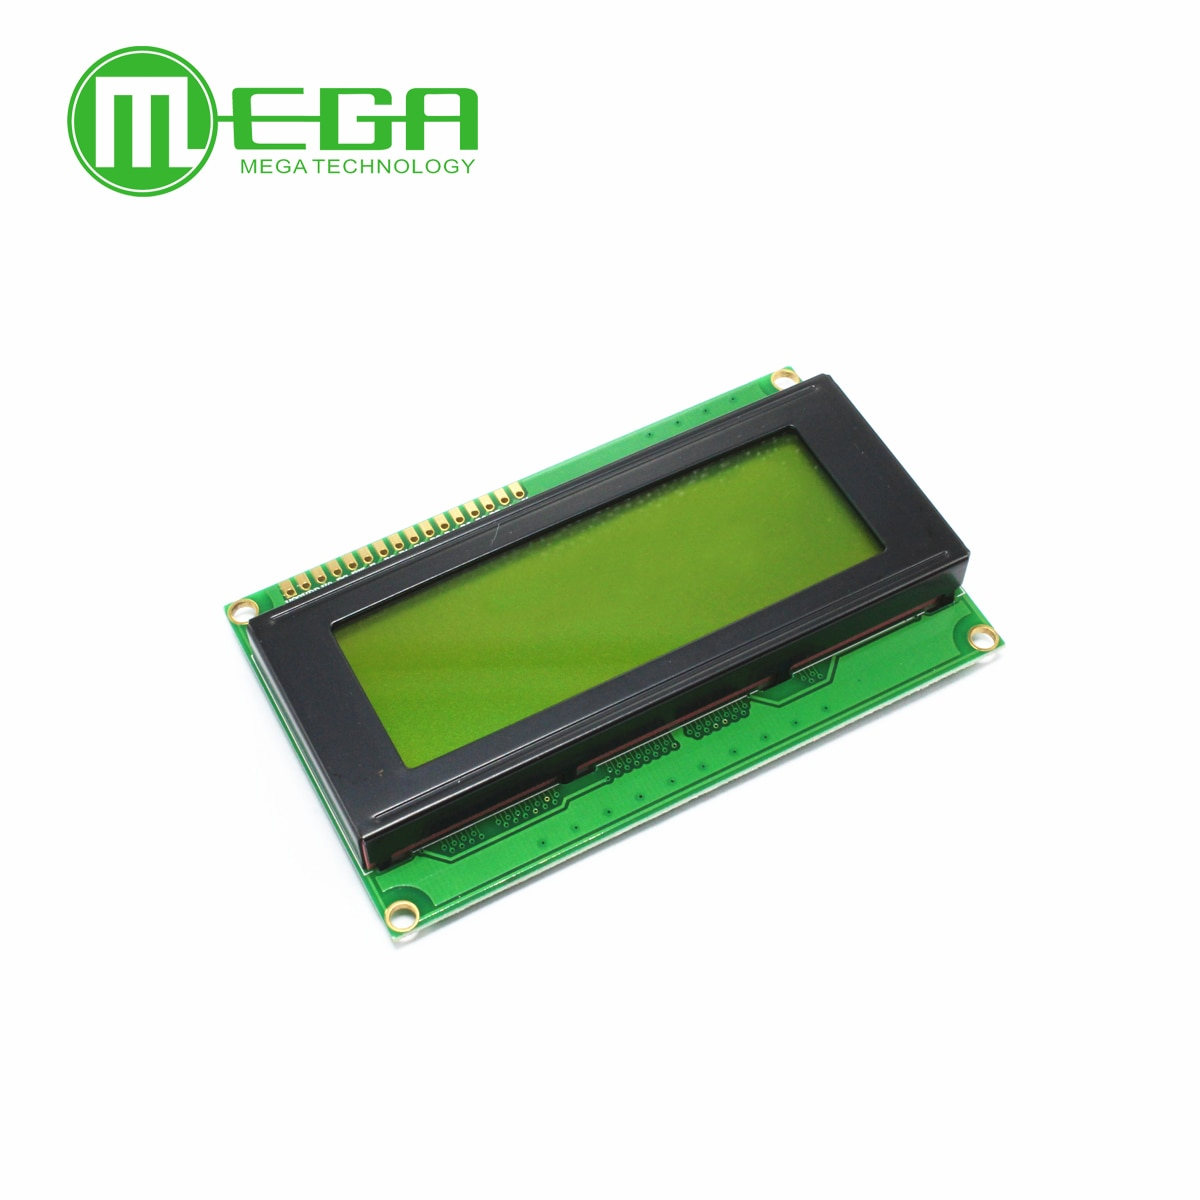 1 шт. 20X4 LCD2004 LCD 2004A LCD 2004 LCD модуль 5 в желтый и зеленый экран/синий экран